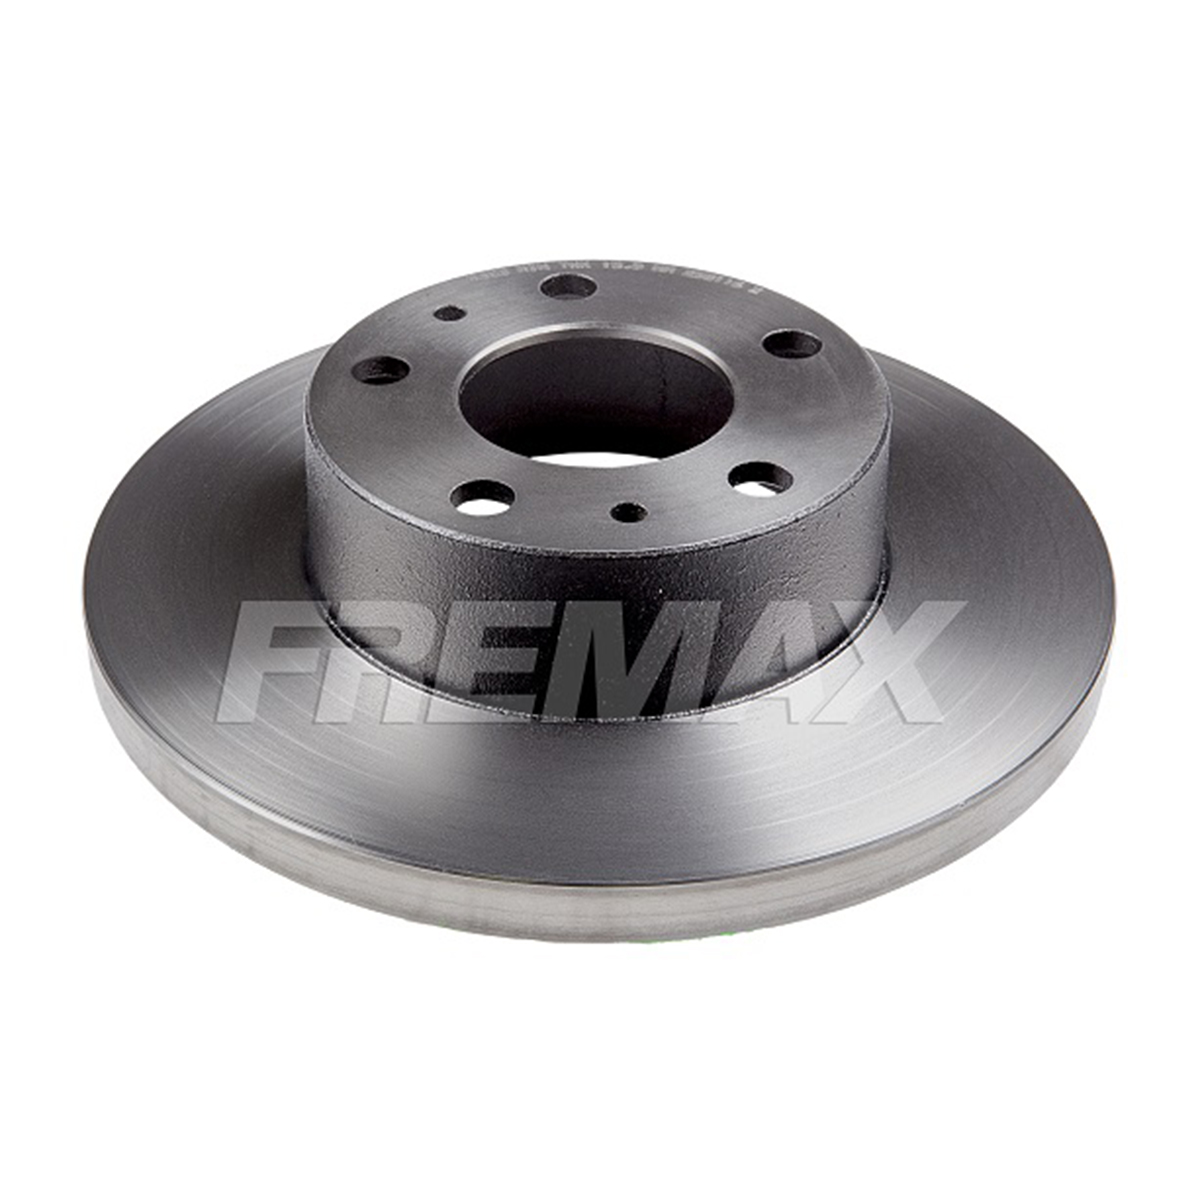 Disco de Freio FREMAX - Eixo Dianteiro - CITROËN Jumper / FIAT Ducato / PEUGEOT Boxer - BD4680 (Sólido e Sem Cubo)